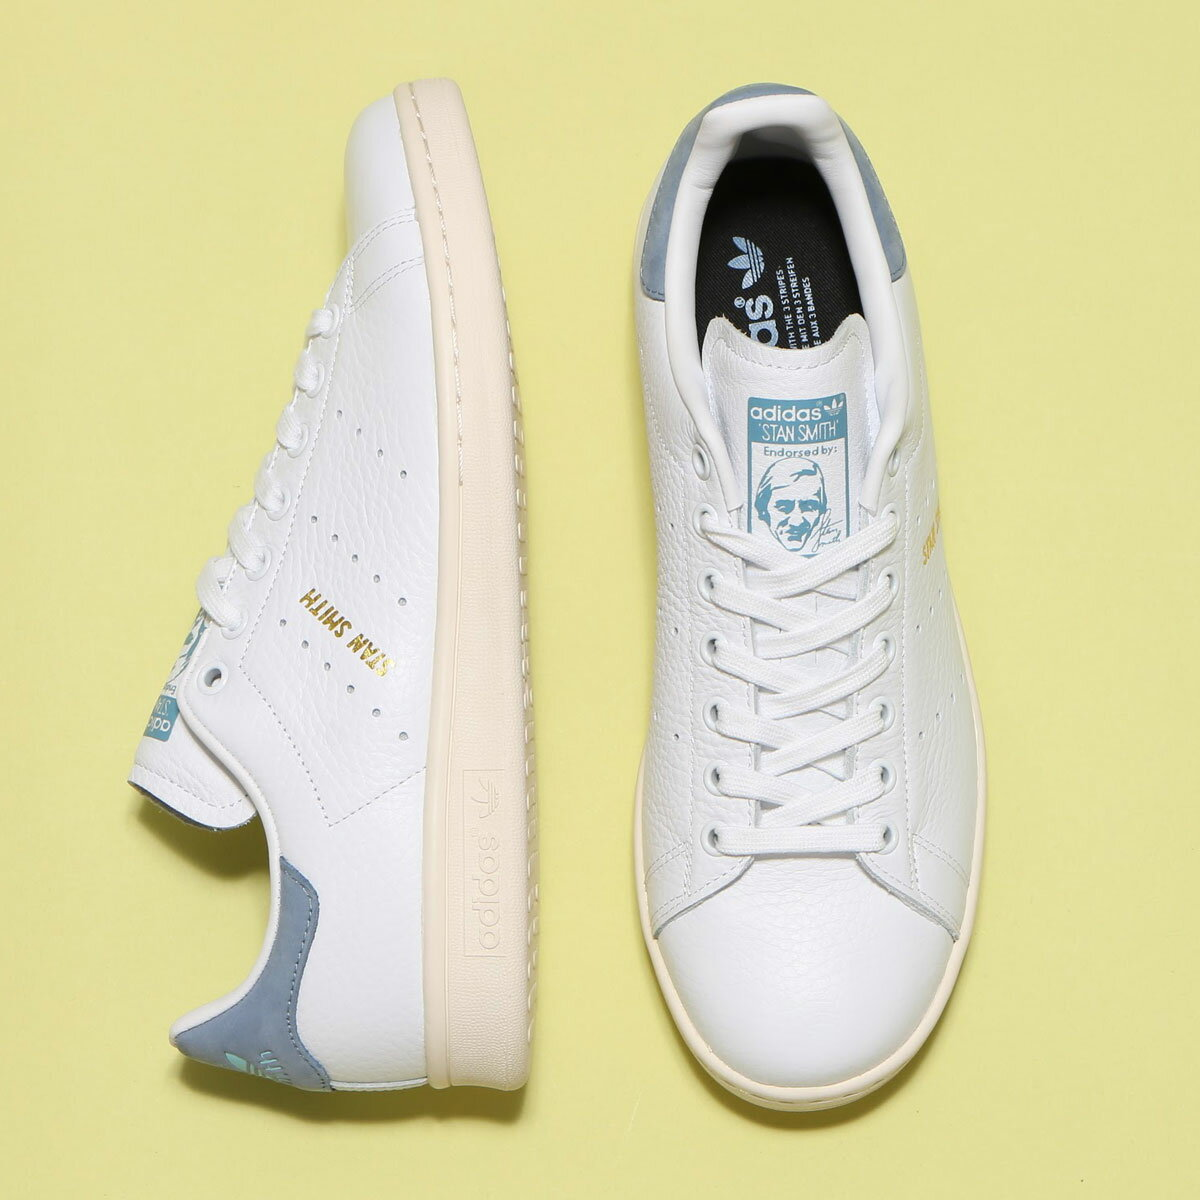 adidas Original STAN SMITH (アディダス オリジナルス スタン スミス) RUNNING WHITE / RUNNING WHITE / TACTILE BLUE【メンズ レディース スニーカー】17FW-S